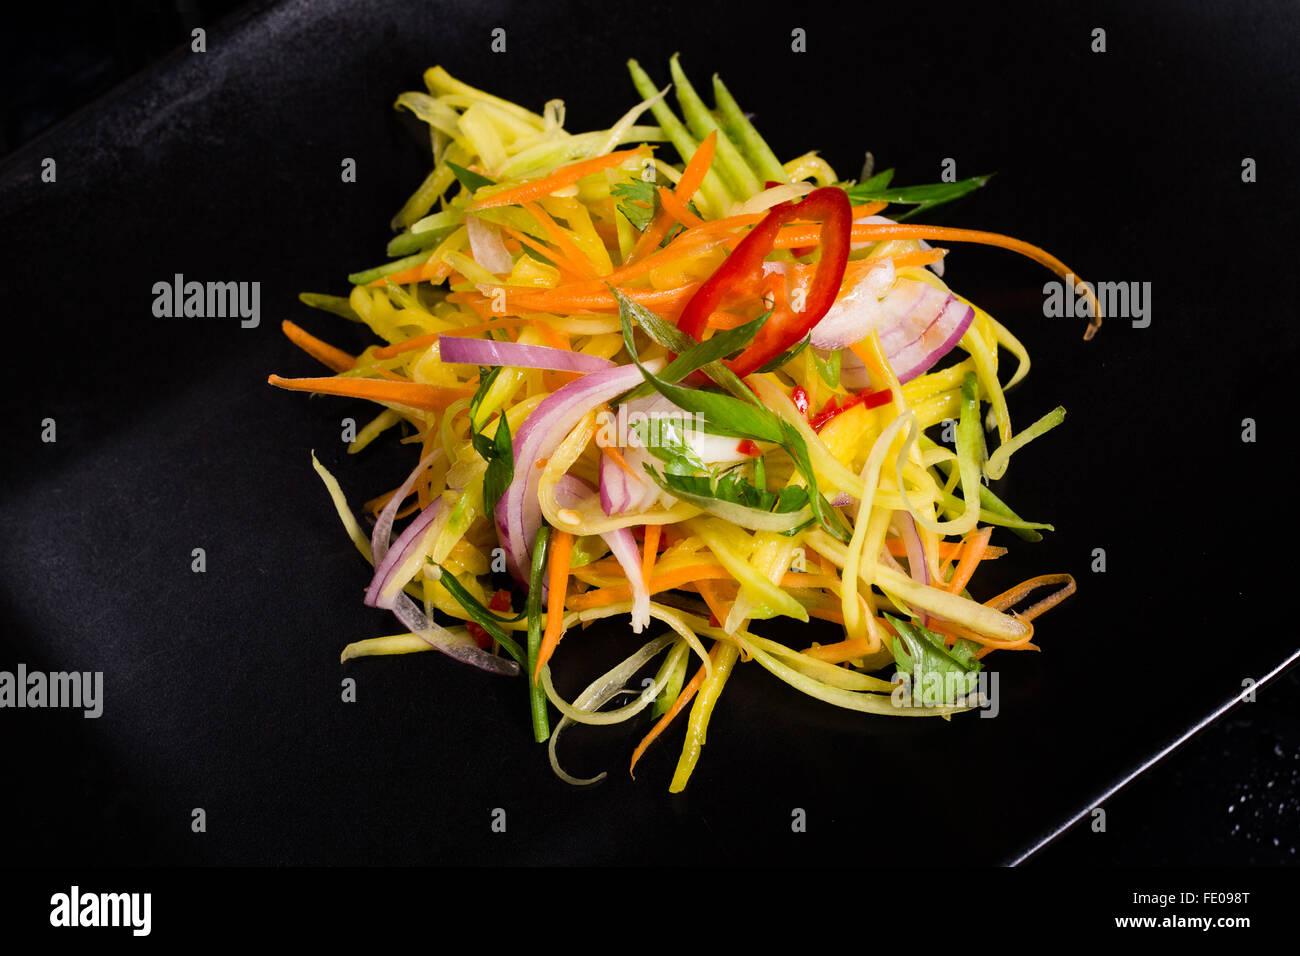 Mango Salat mit roten Zwiebeln, Chilli und Karotten , Asiatischer Fruchtsalat Asian Style Mango Salad on black plate Stock Photo